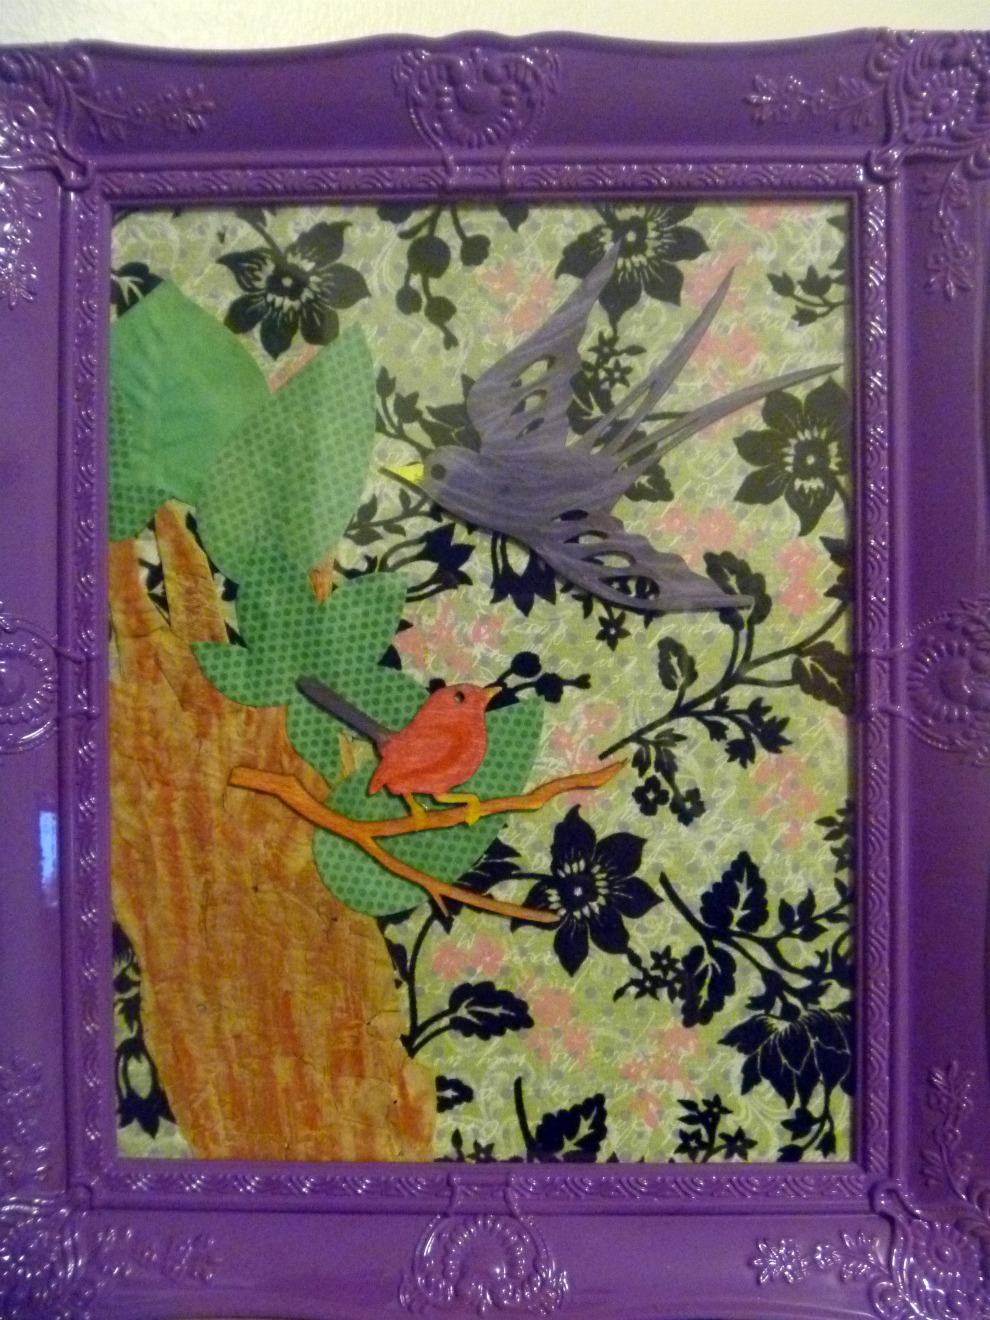 Lily's Deco Birds